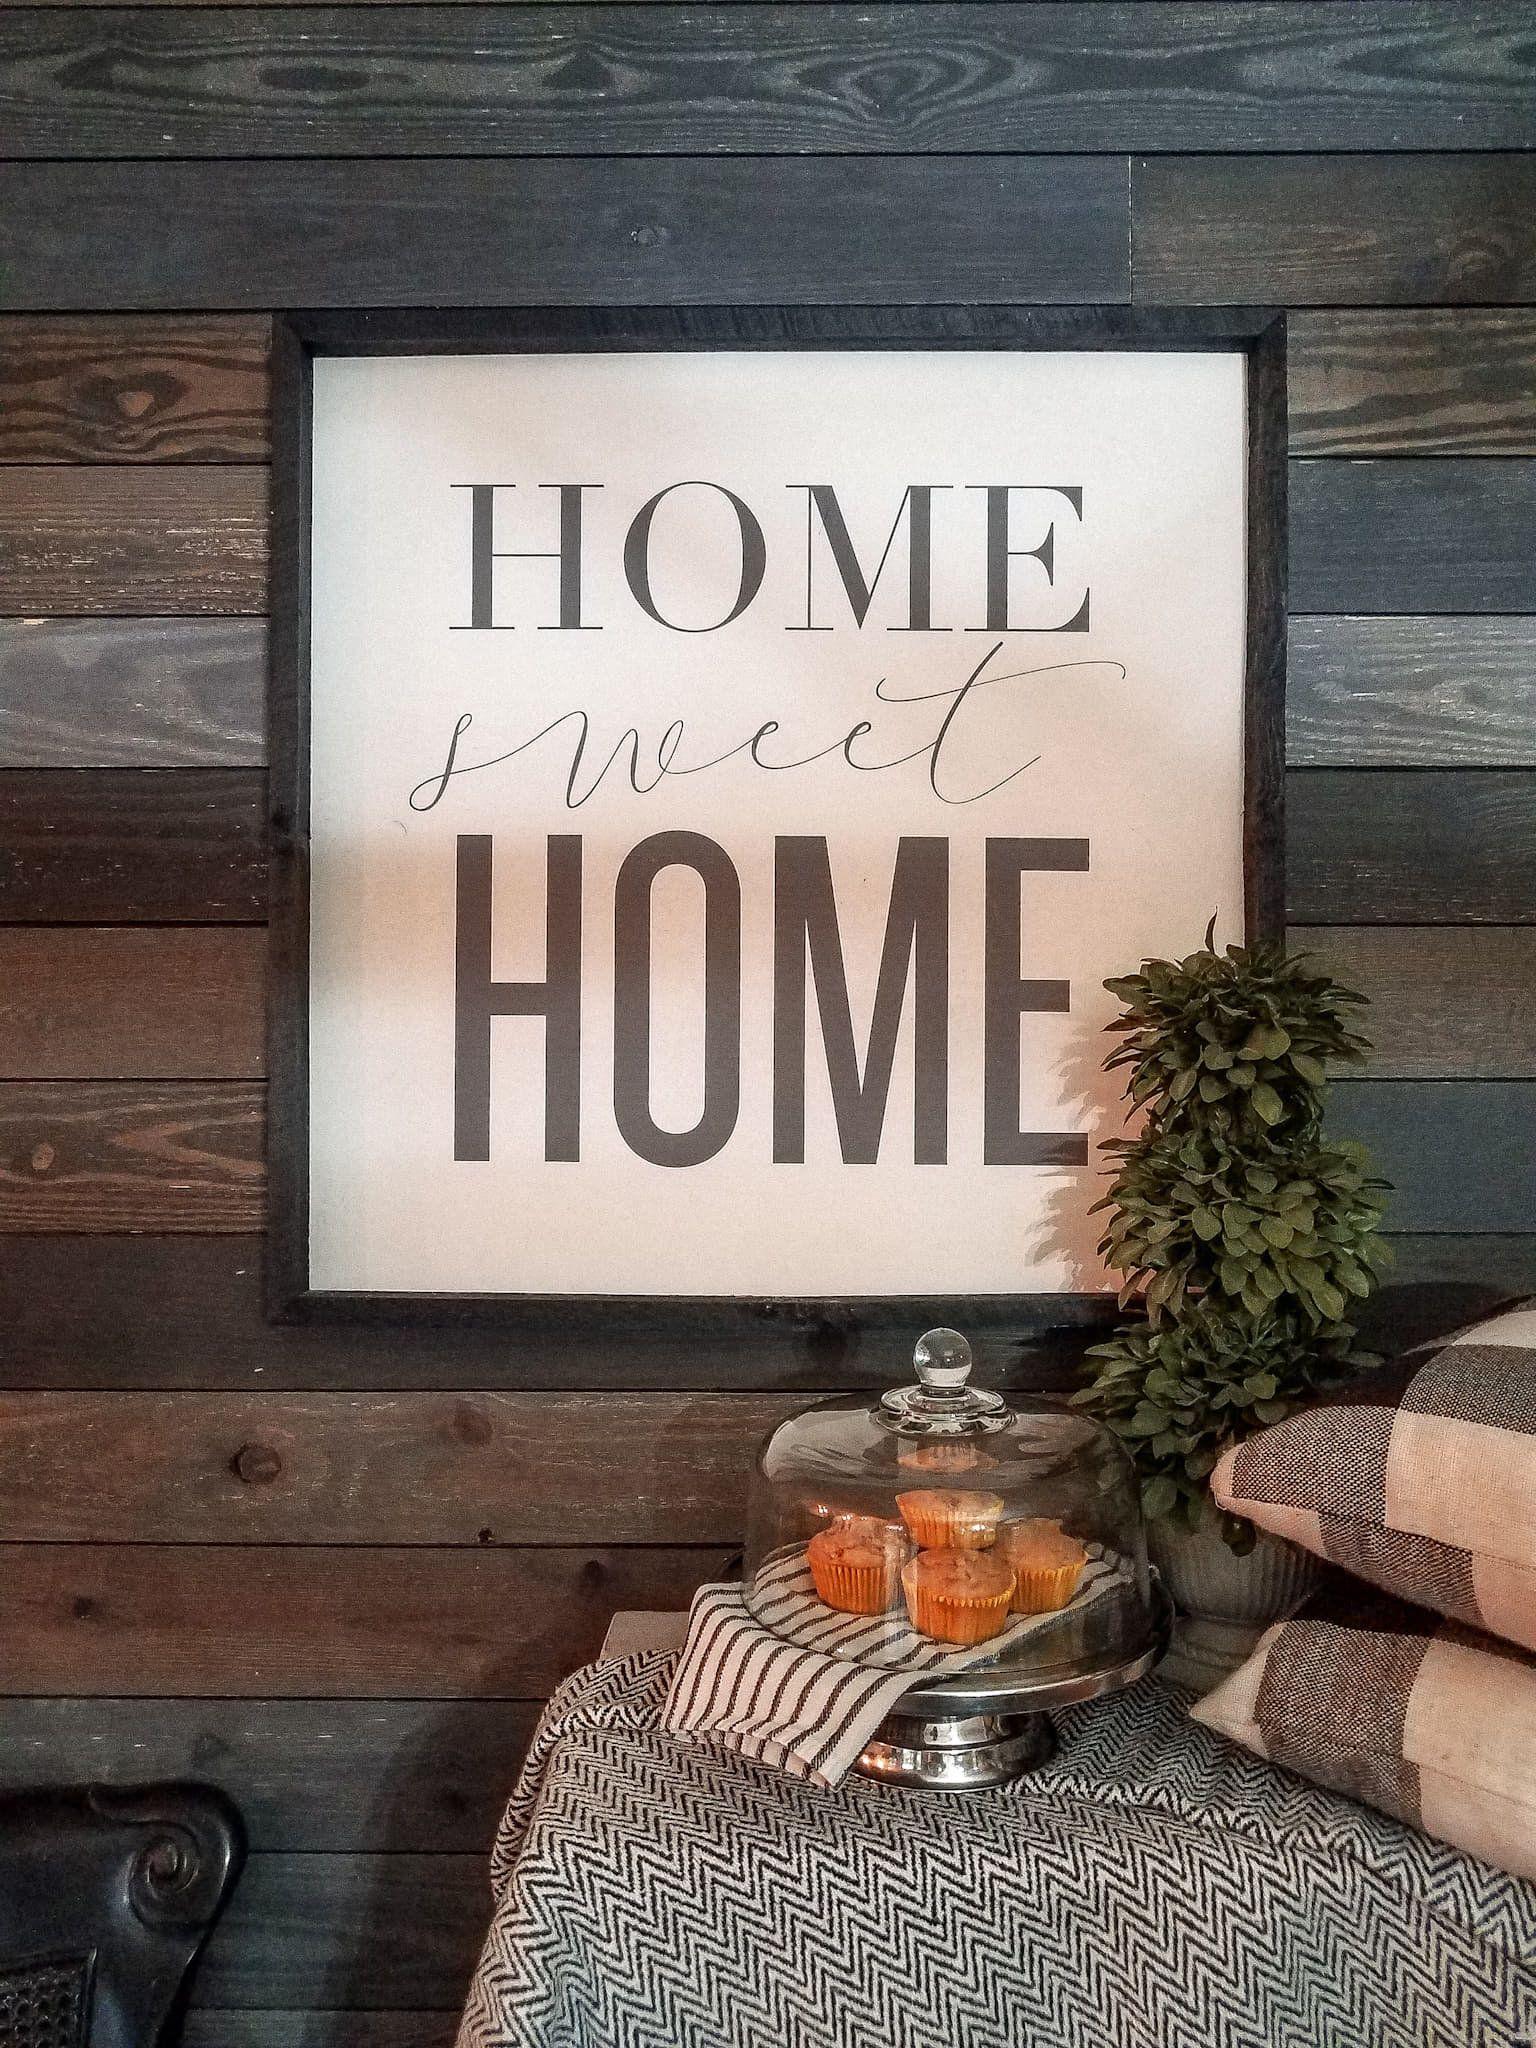 Loving my homesweethome handpainted sign homedecor etsy white black home